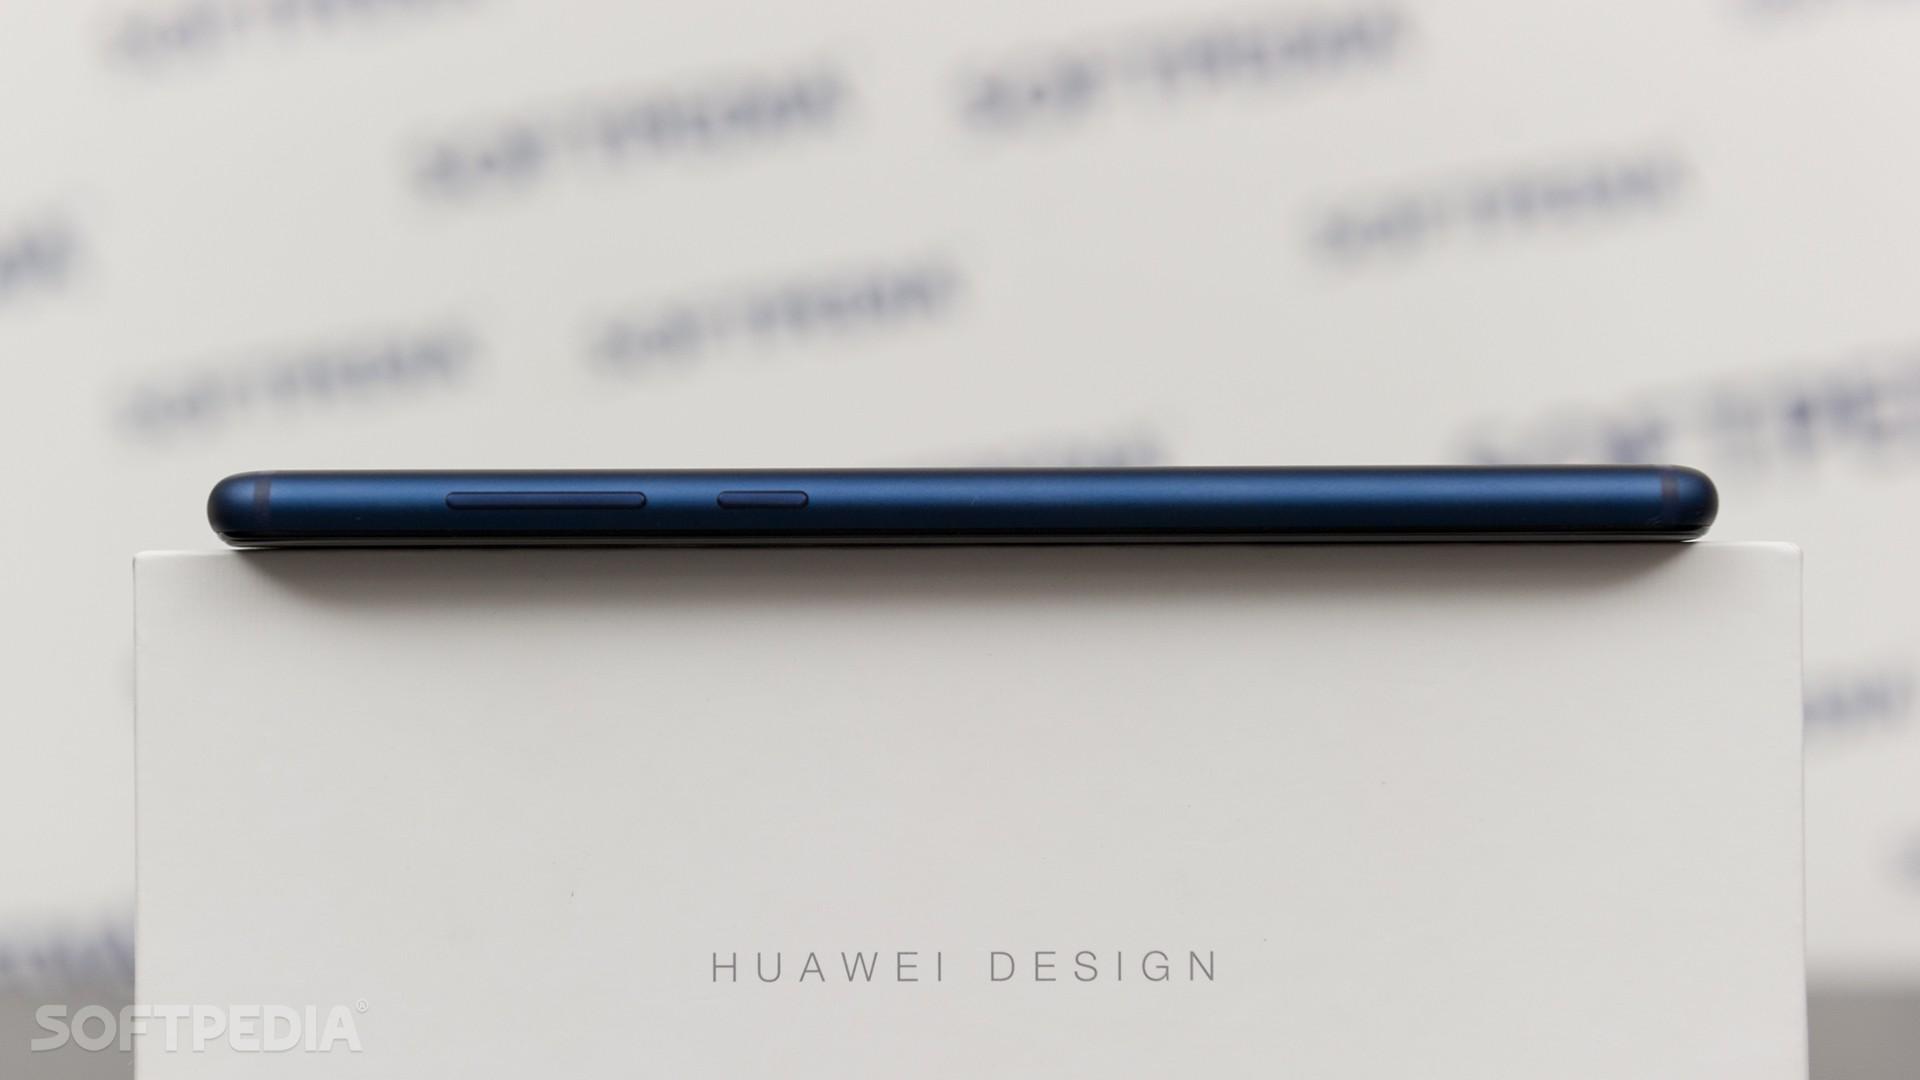 Huawei Mate 10 Lite Review - Four-Camera Deception